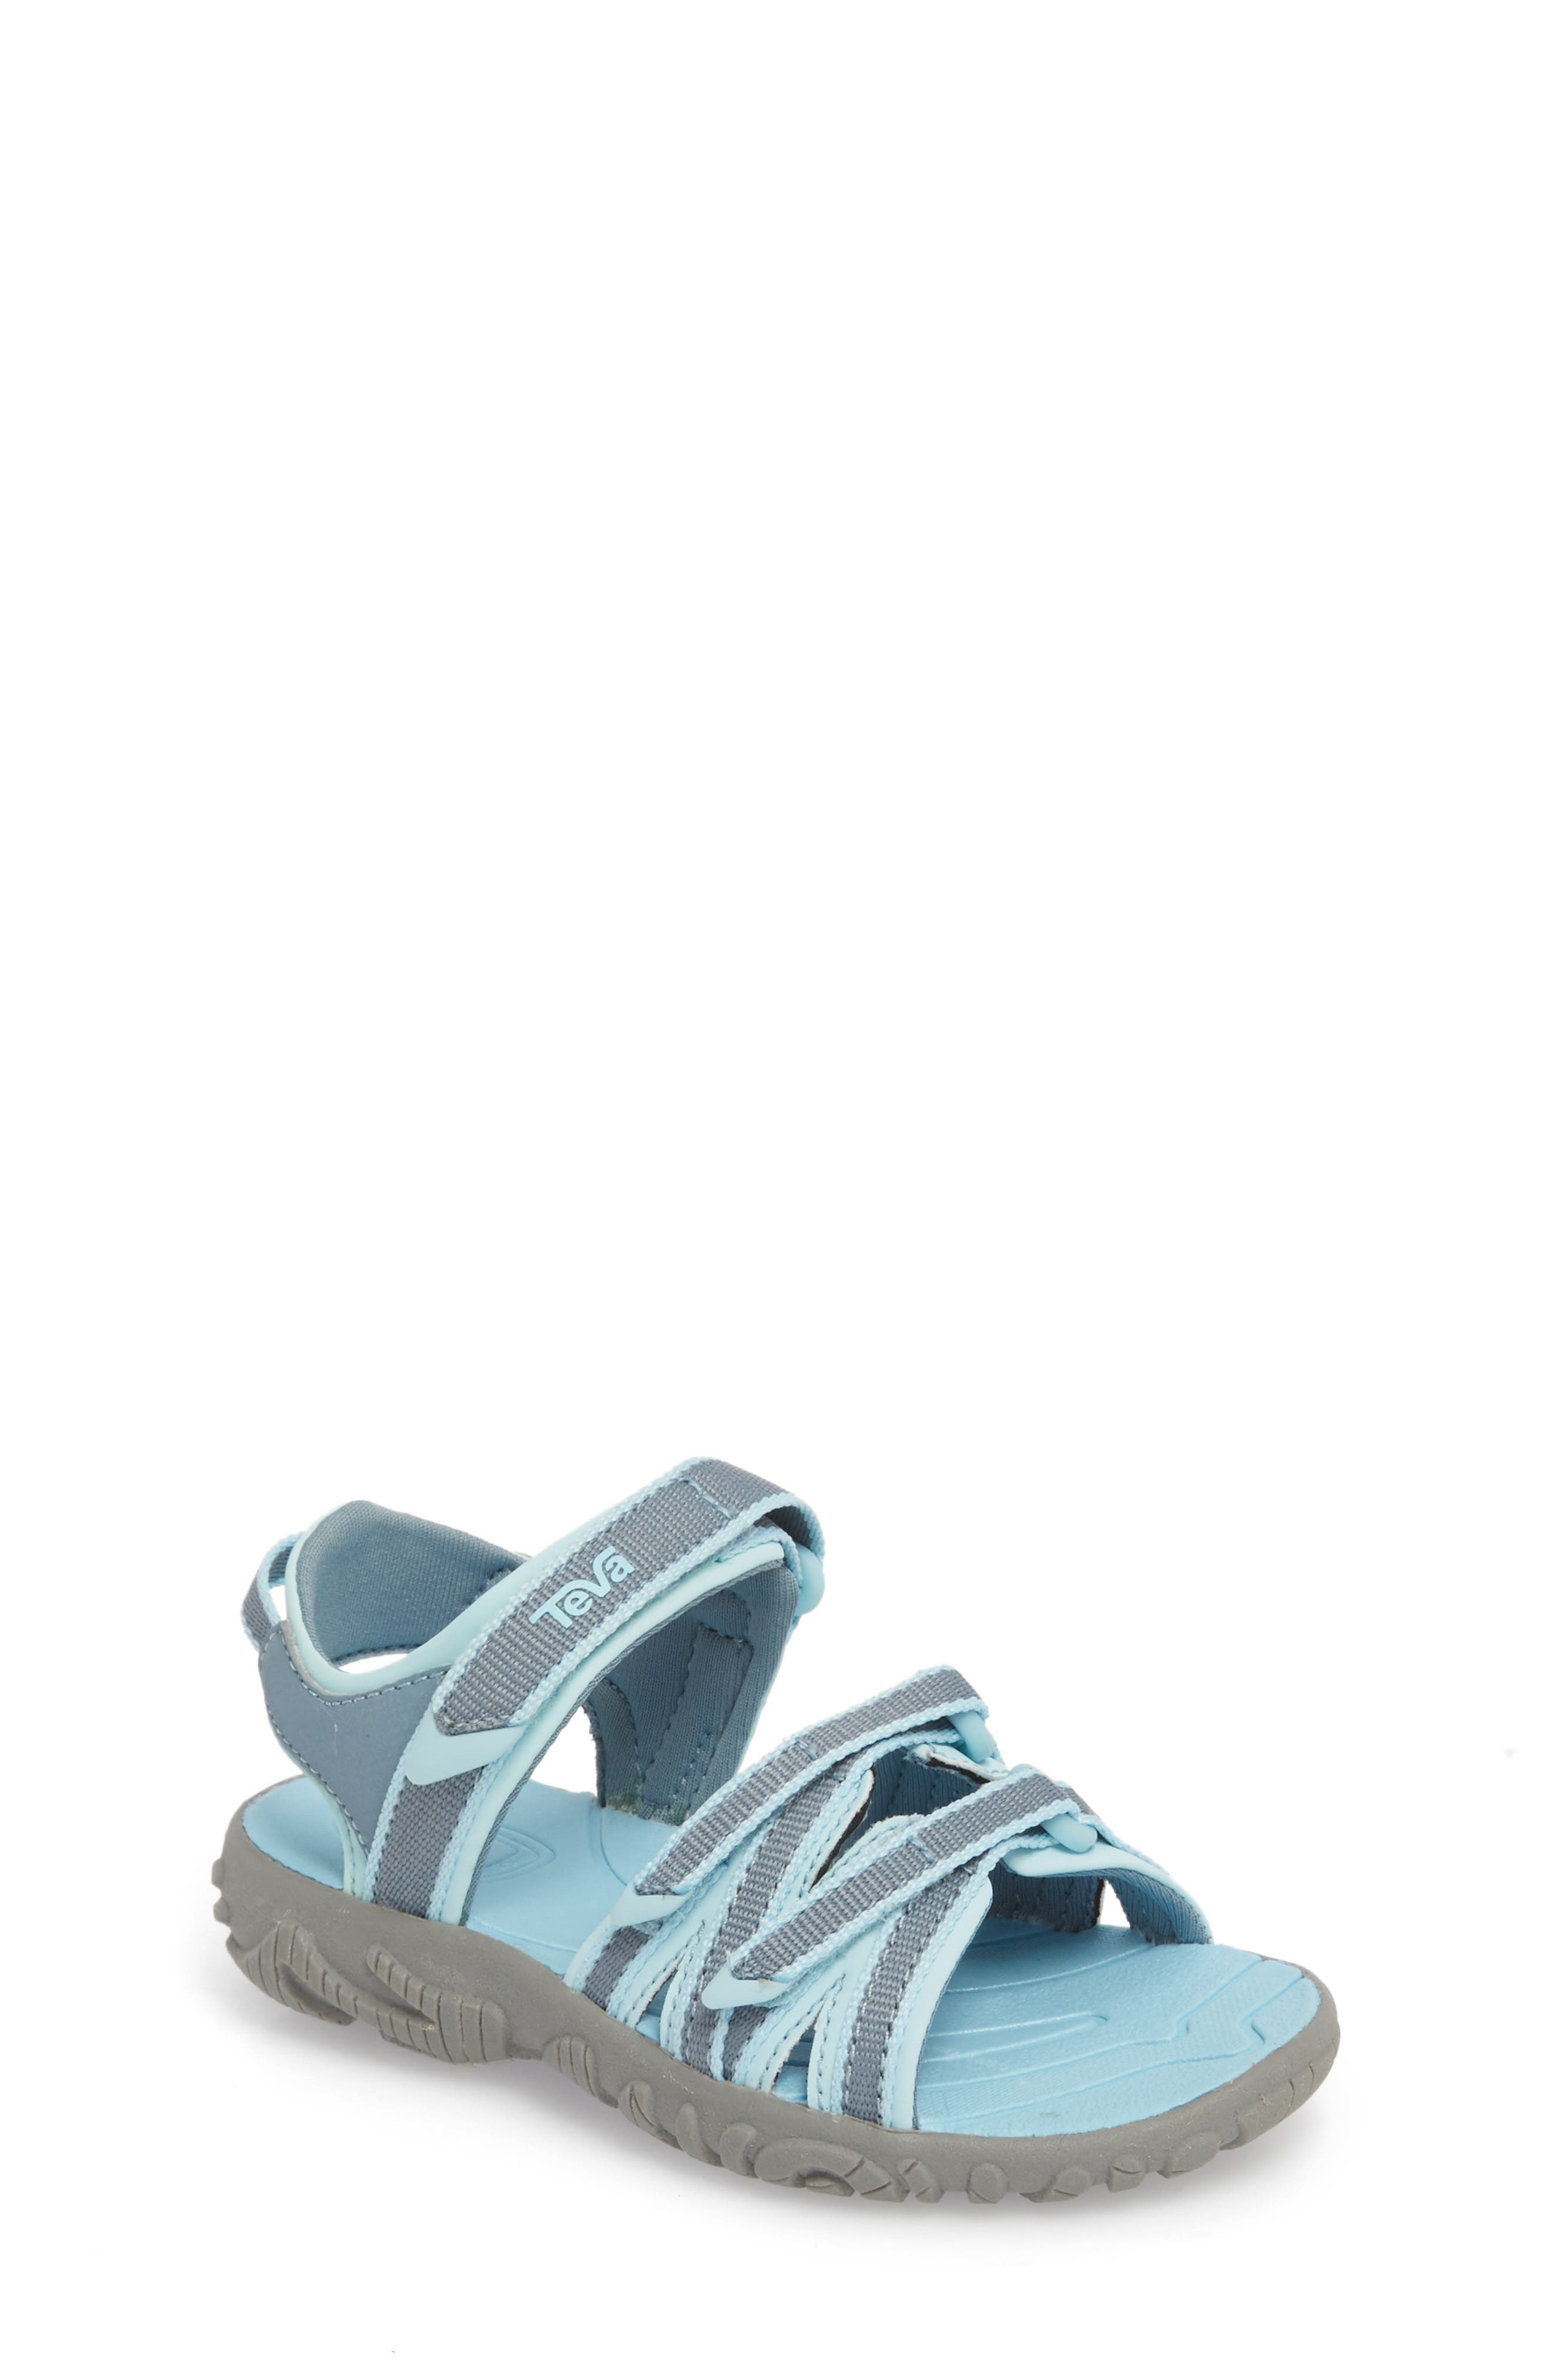 Tirra Sport Sandal,                         Main,                         color, 456